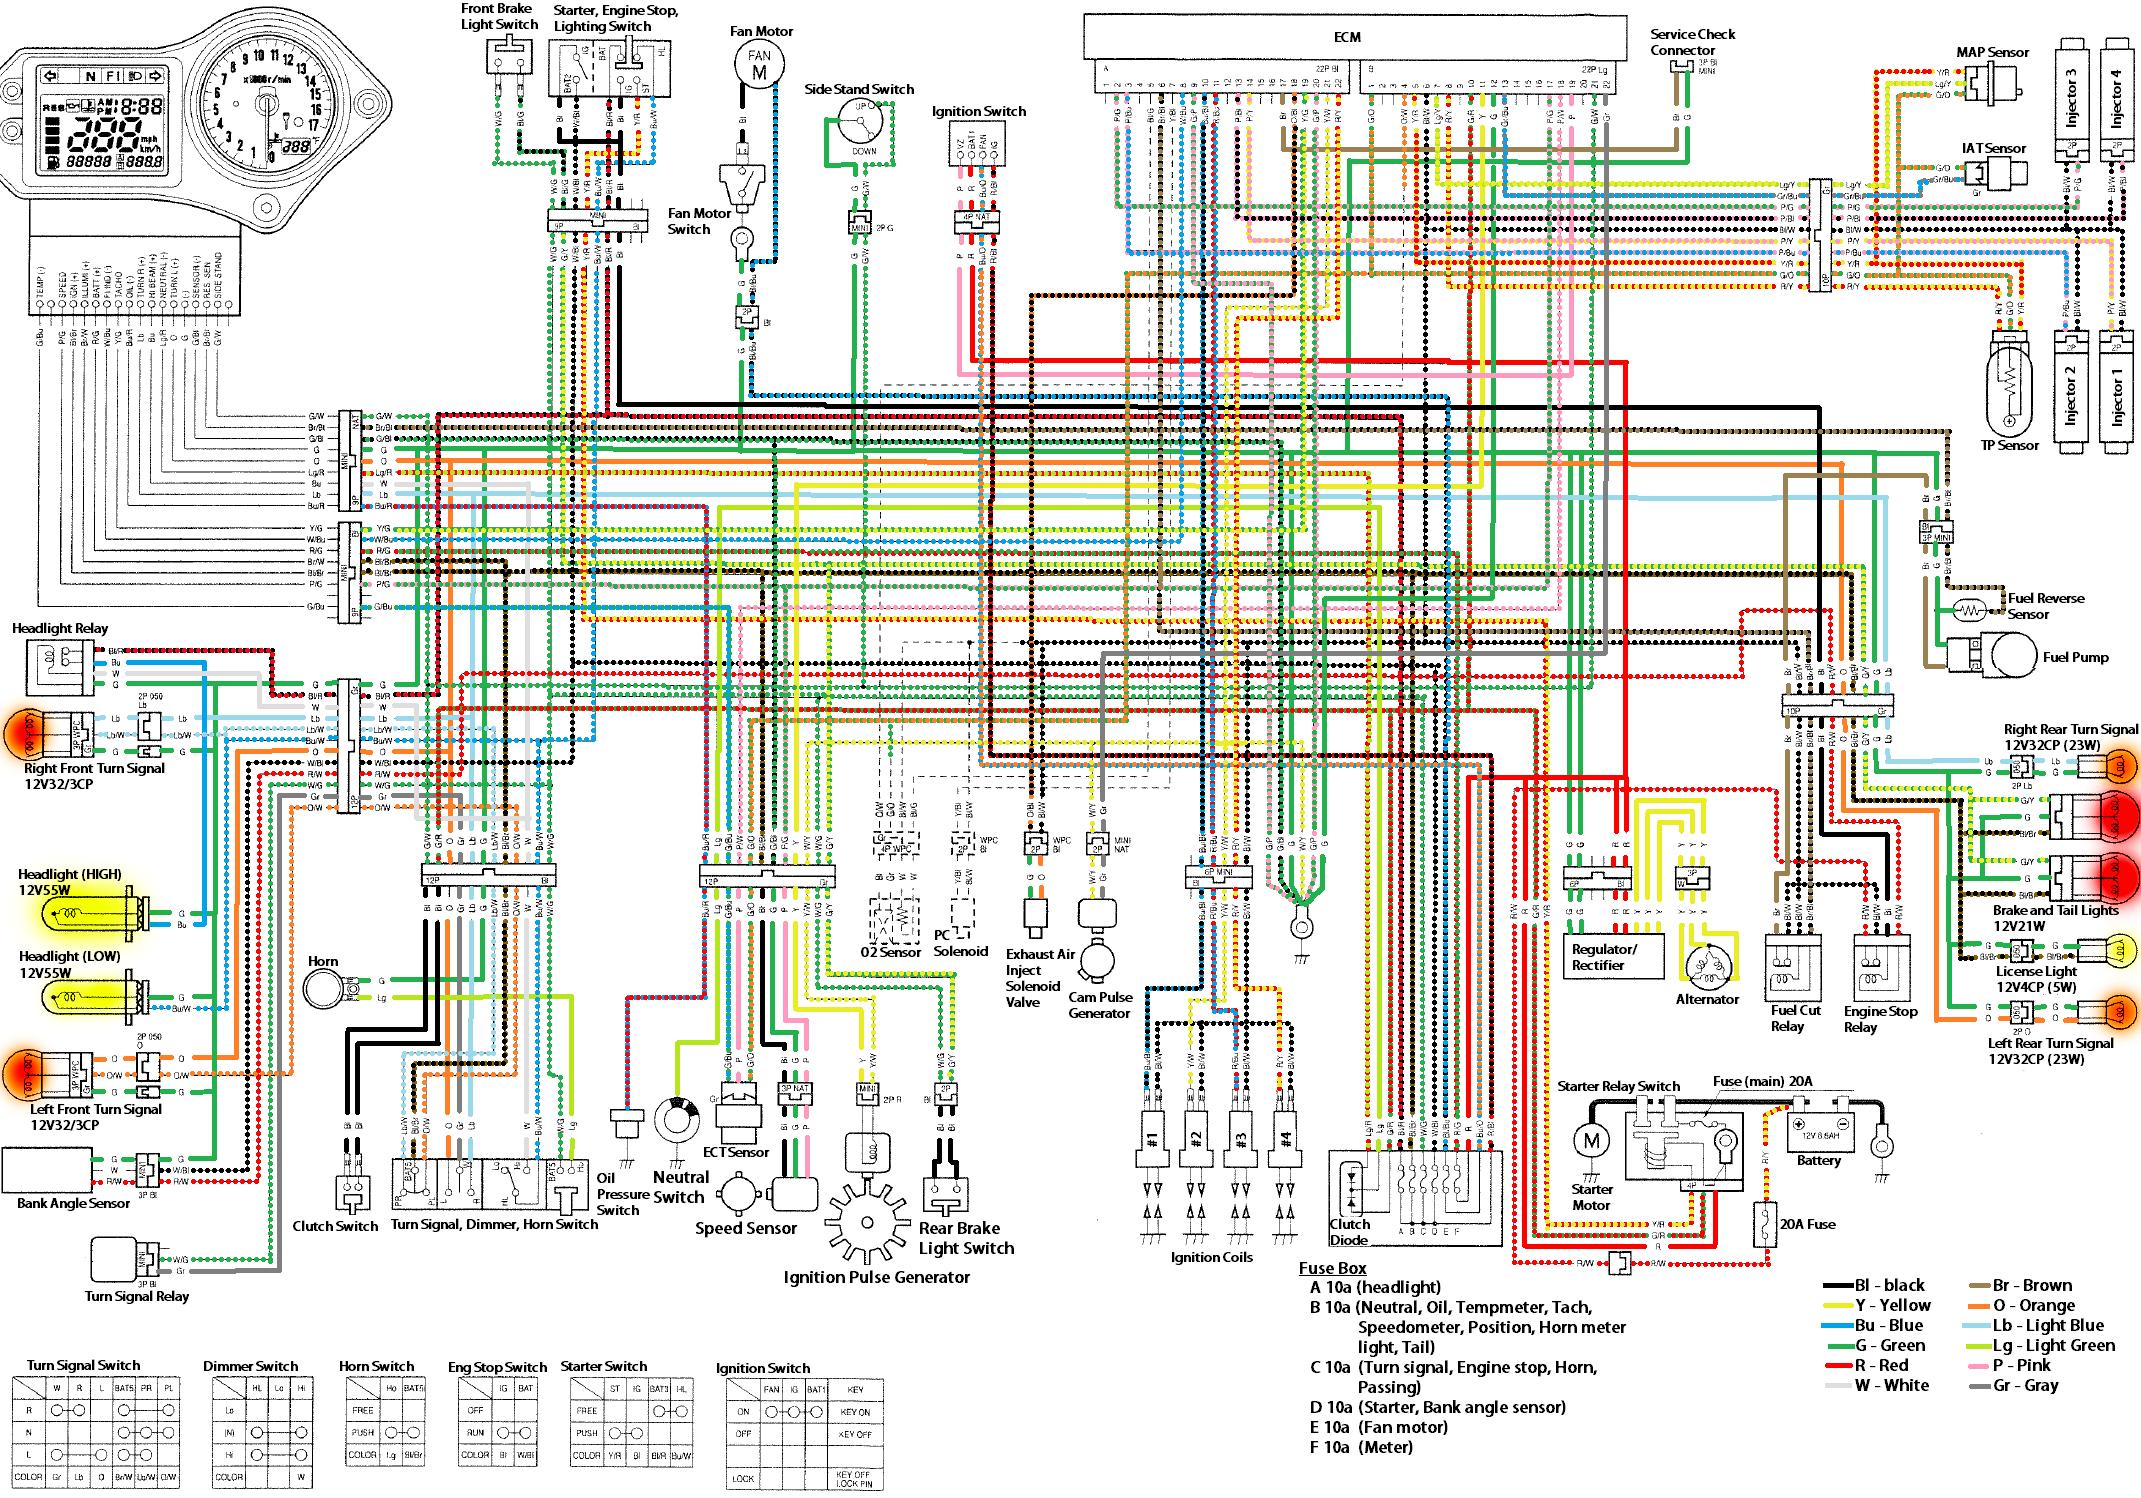 DIAGRAM] Starting Wiring Diagram 97 Honda F4 FULL Version HD Quality Honda  F4 - AURICULARDIAGRAM.PLUSMAGAZINE.IT